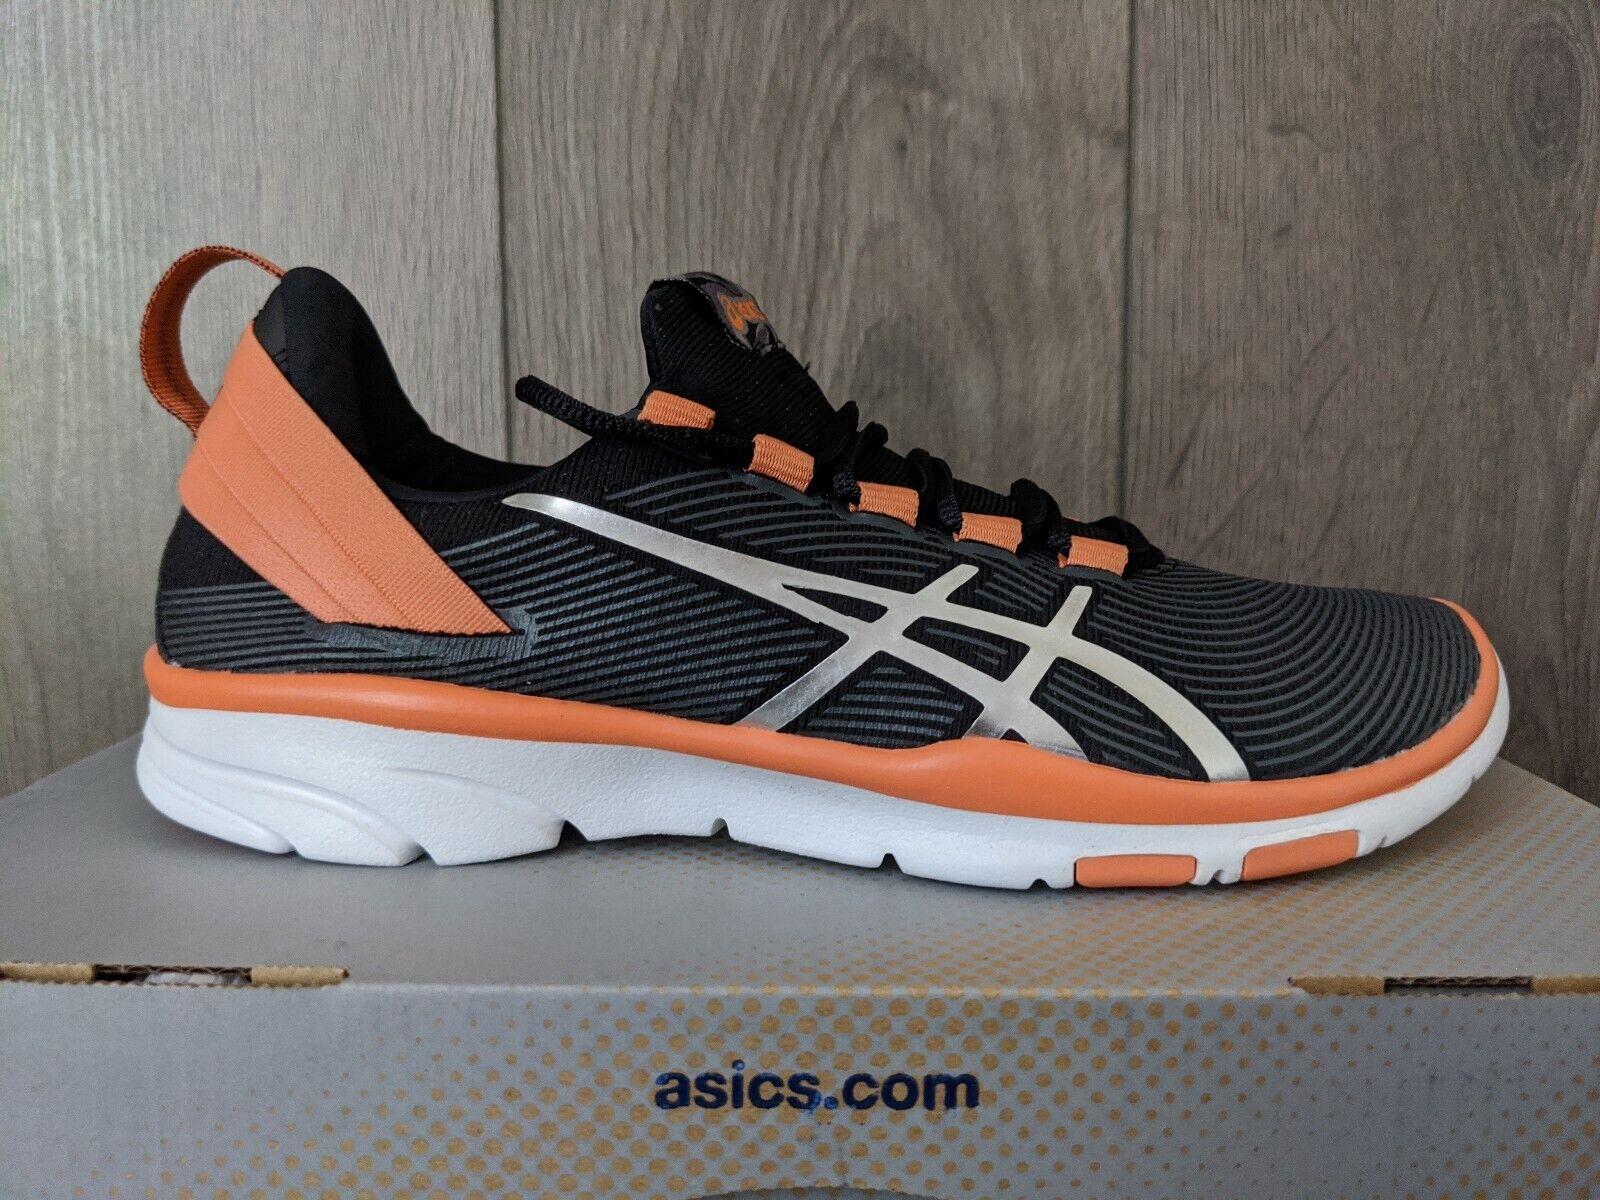 asics womens running shoes uk for ladies